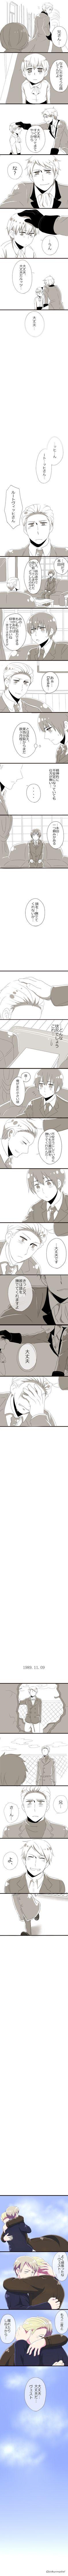 Axis Powers: Hetalia/#1320569 - Zerochan